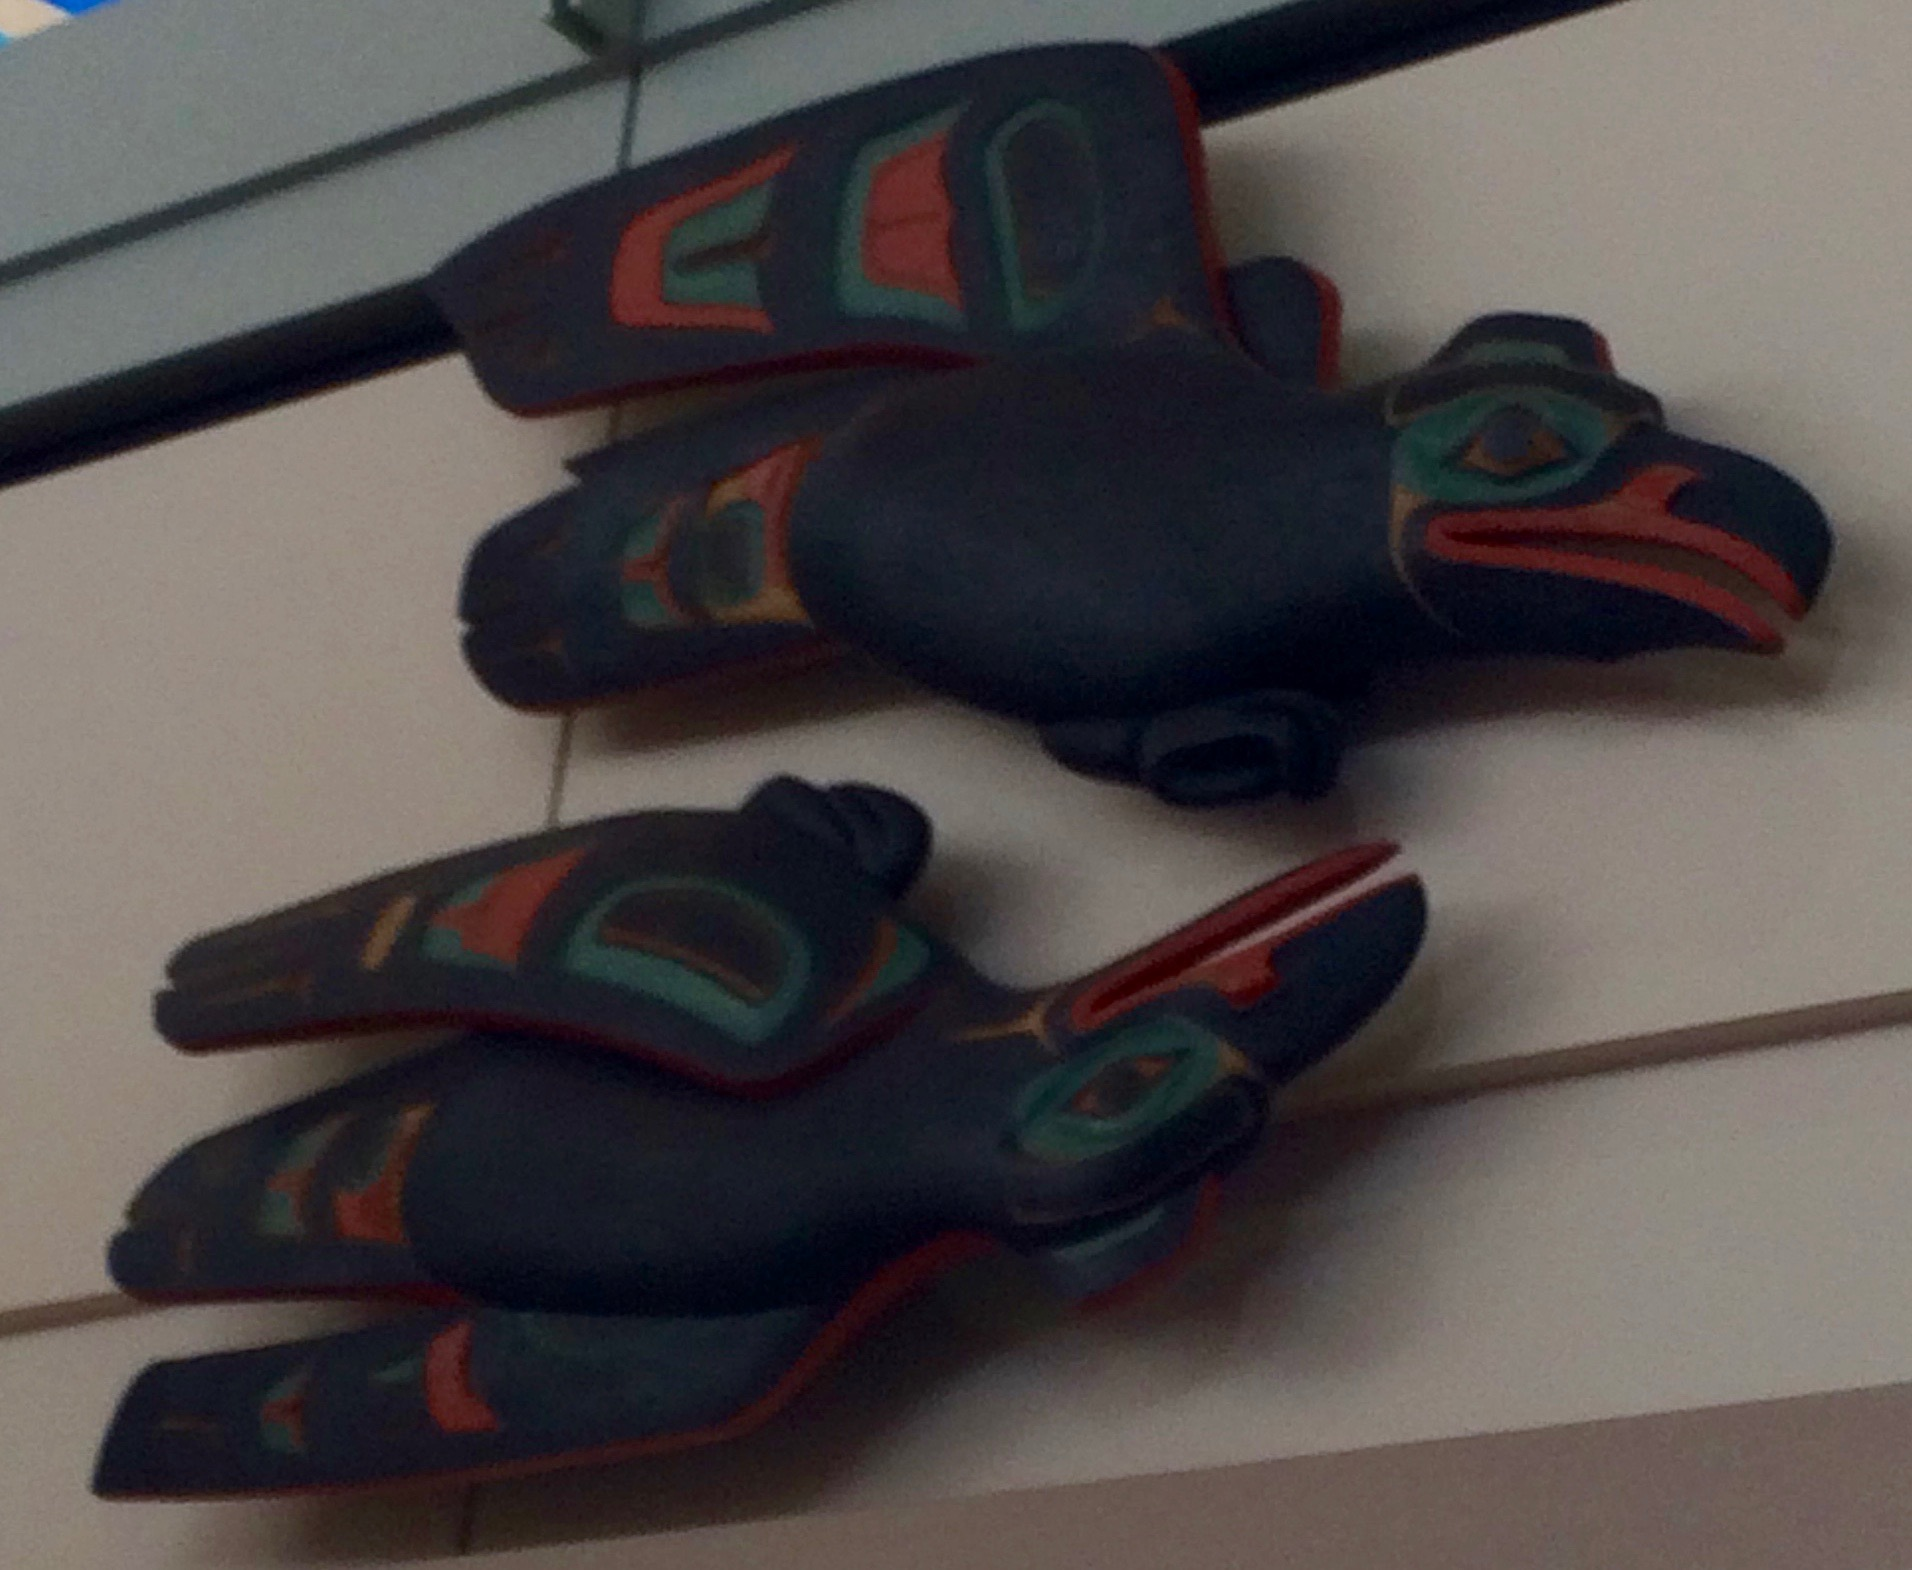 Raven sculptures in Anchorage airport